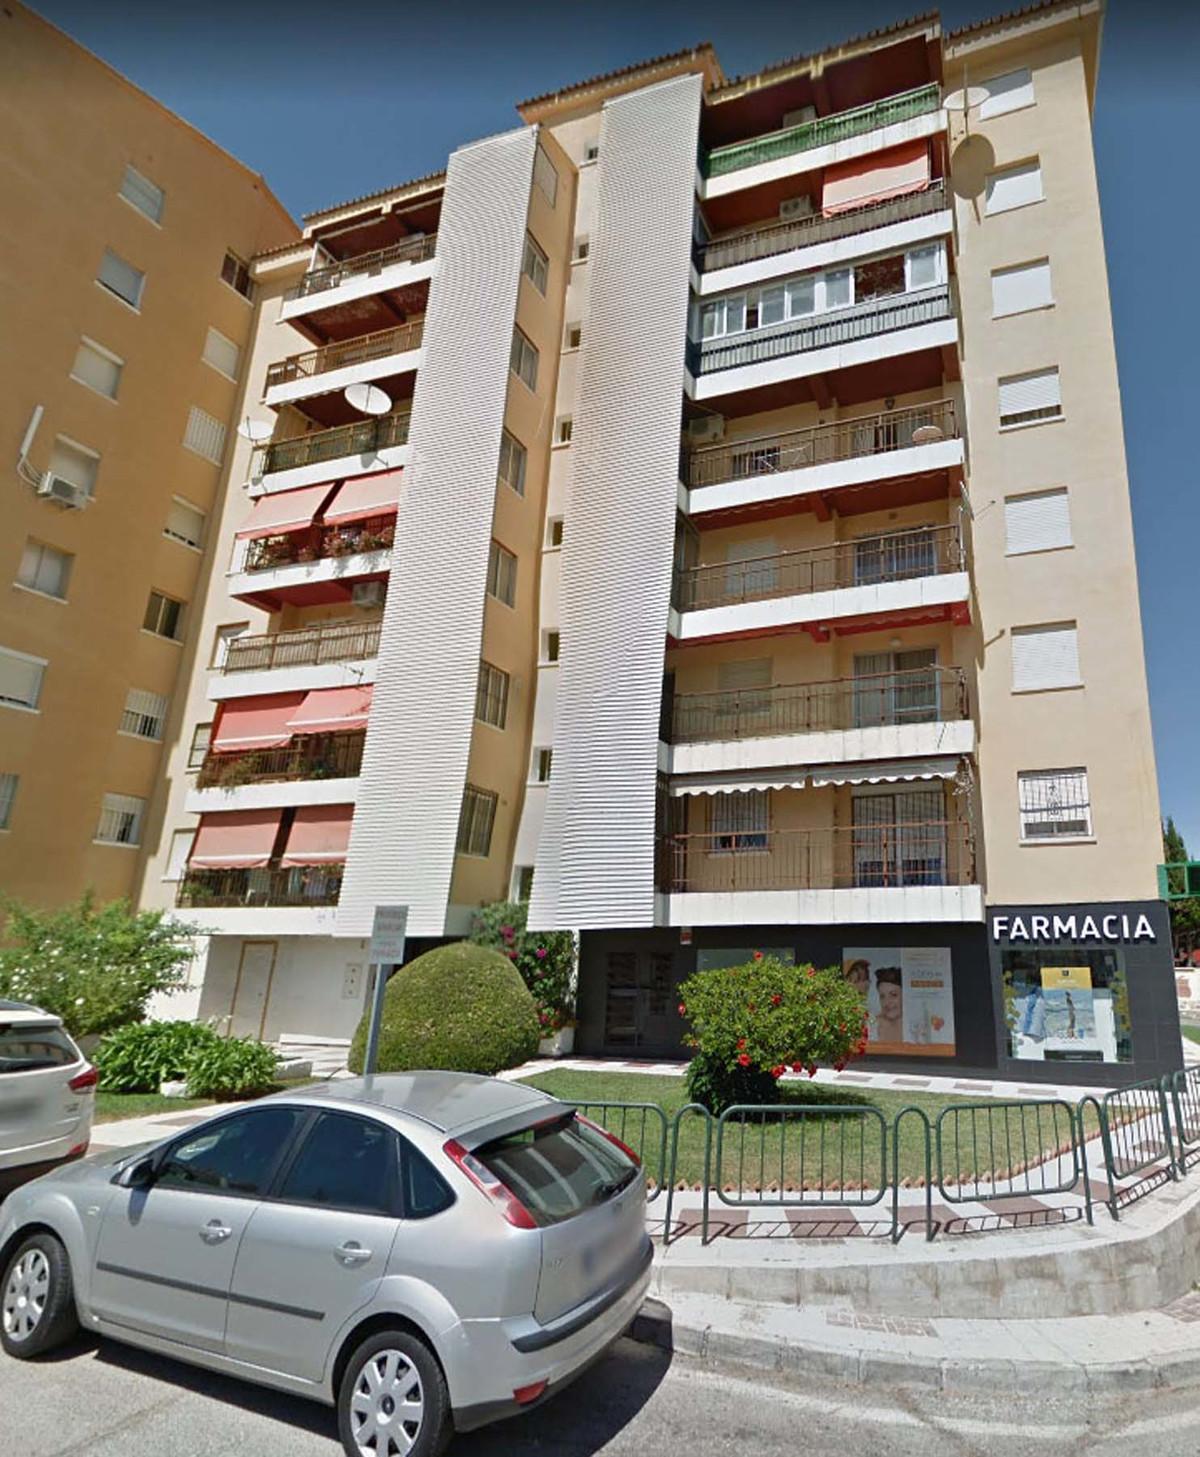 3 bedroom apartment for sale torremolinos